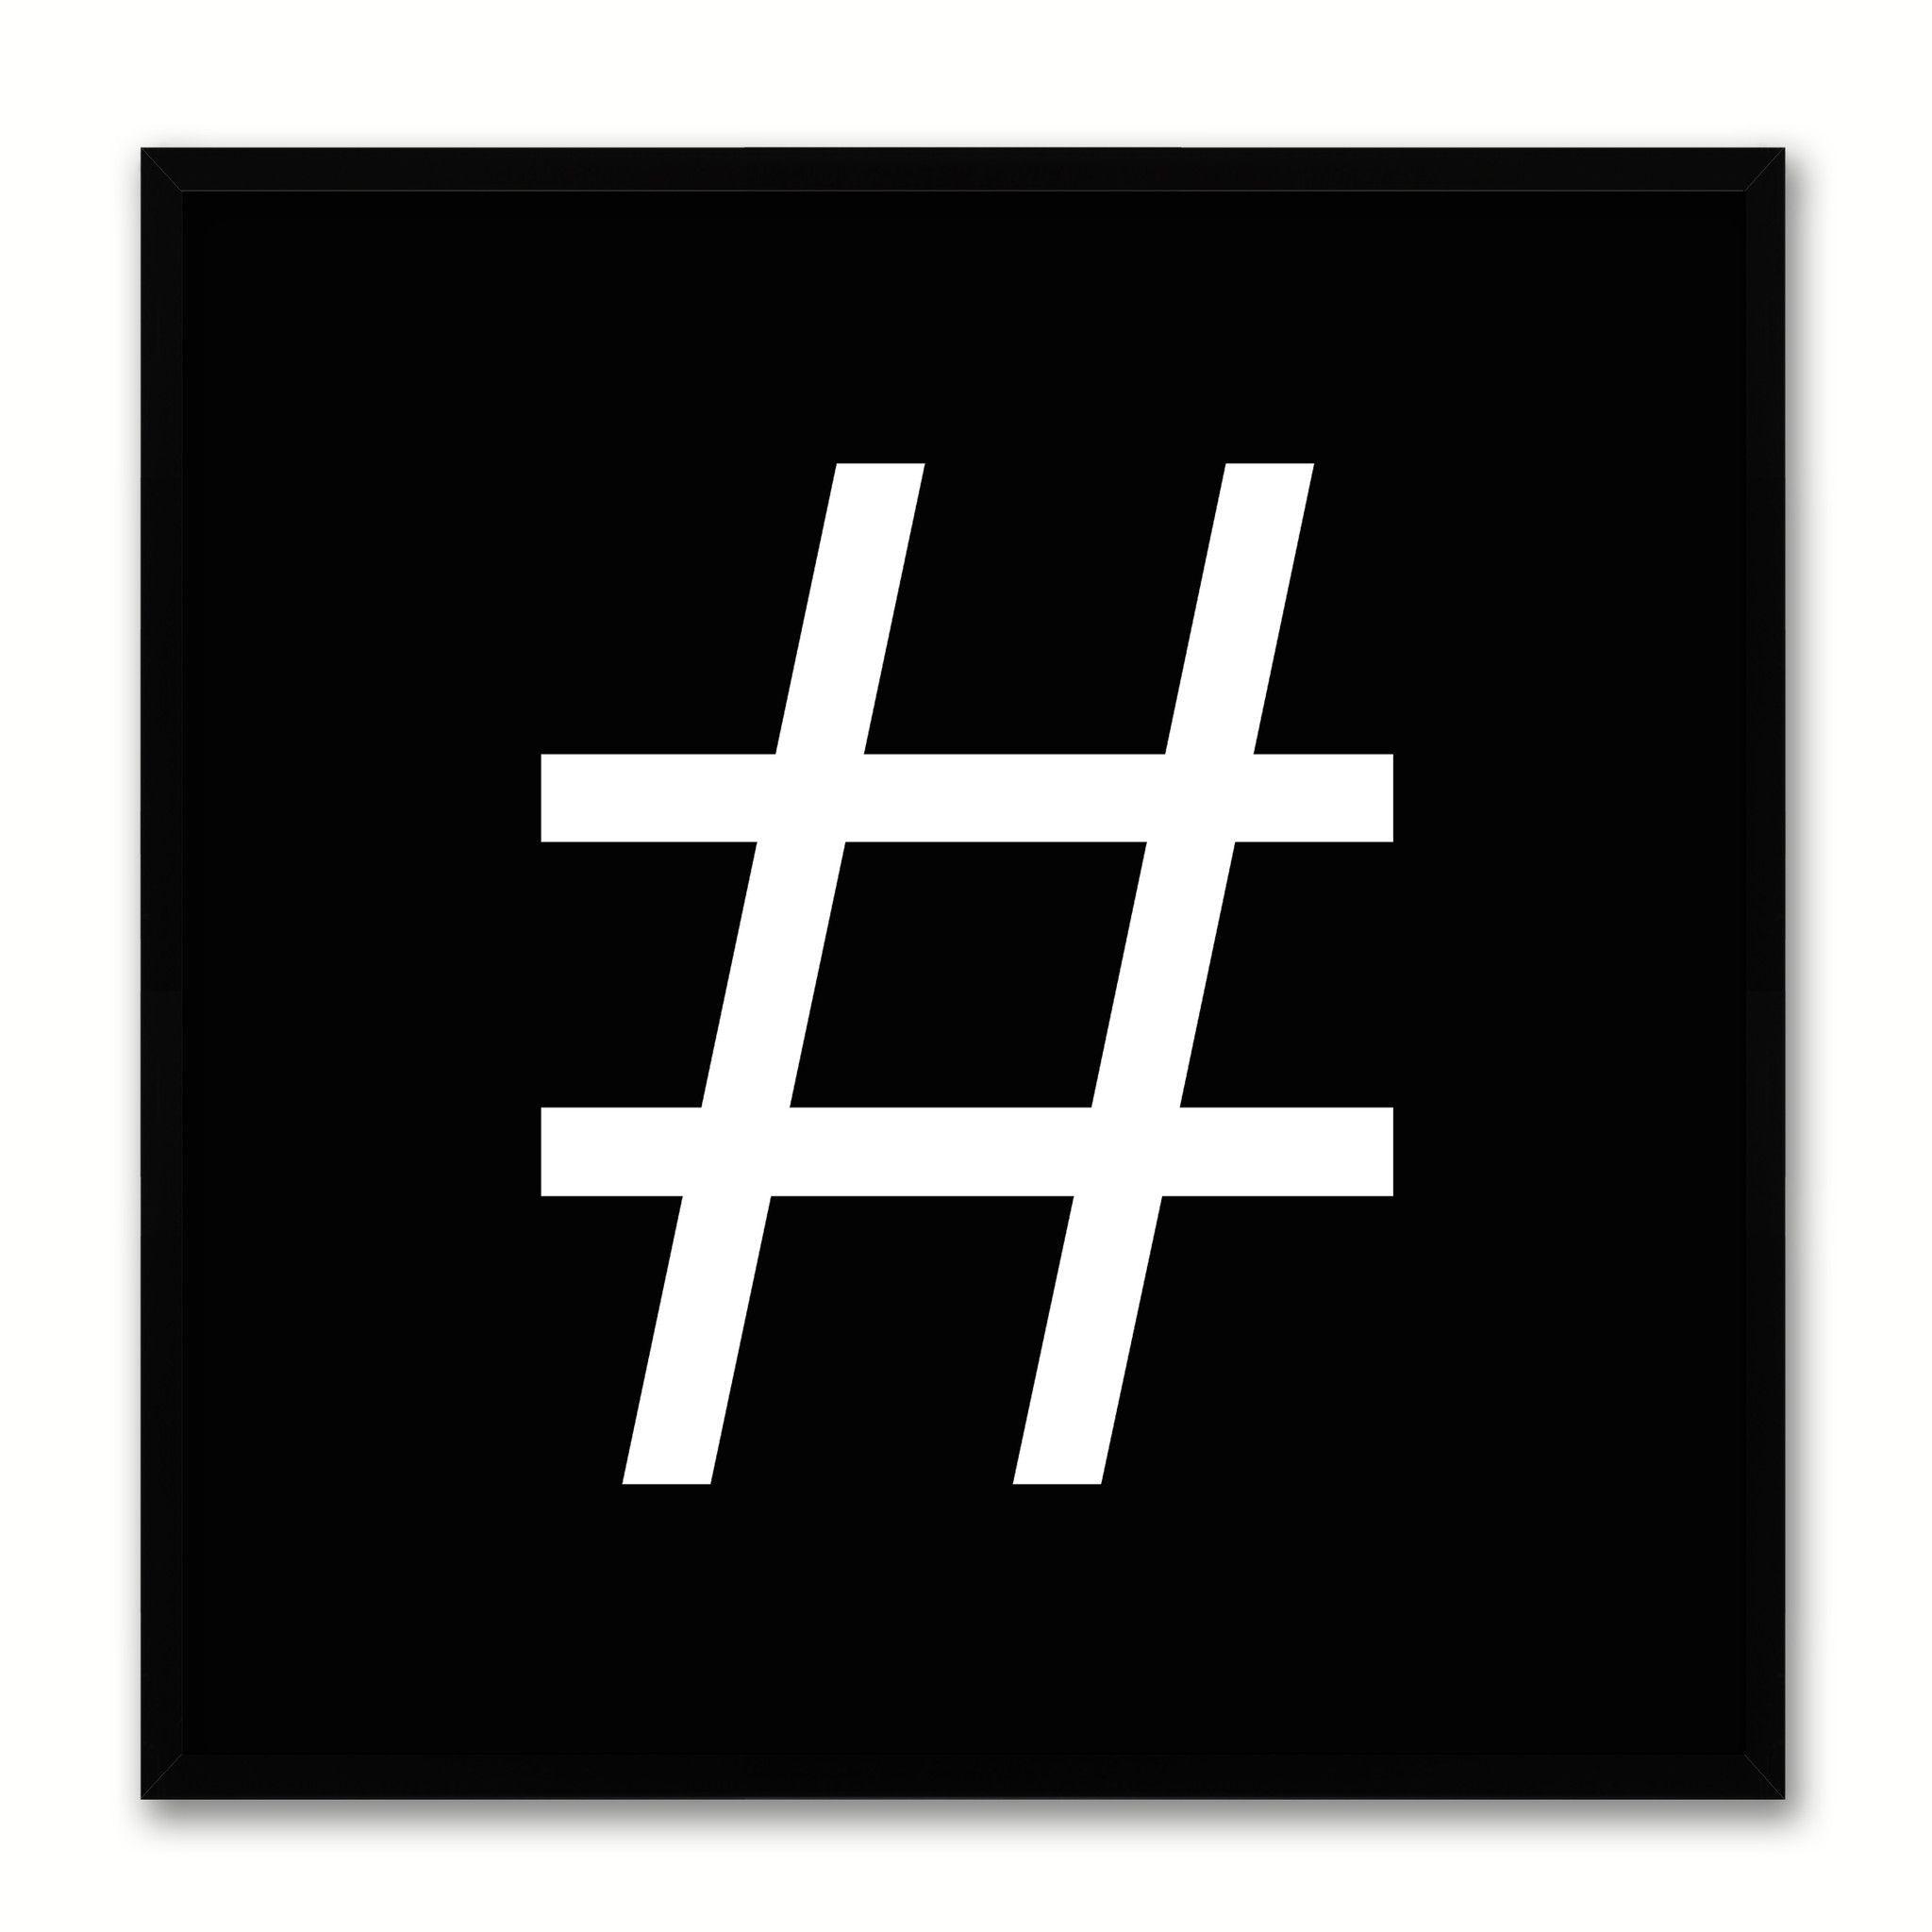 Hashtag Social Media Icon Canvas Print Picture Frame Wall Art Home Decor